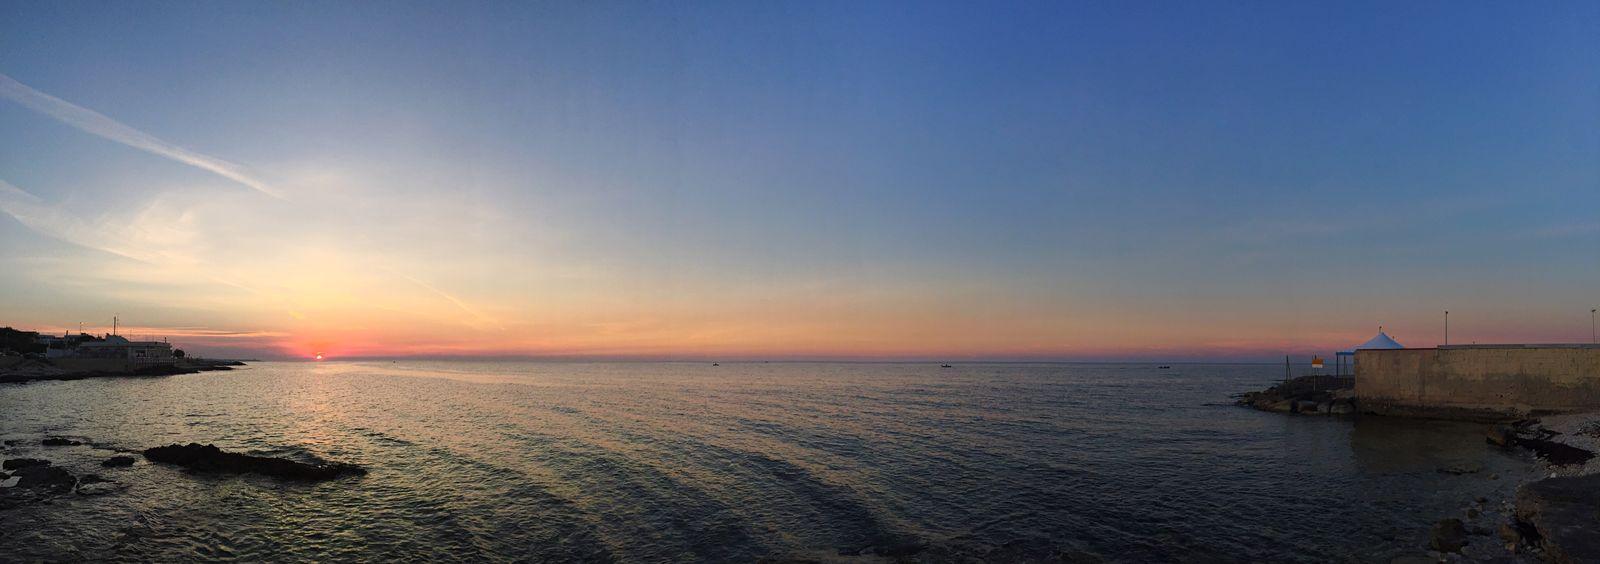 Sunset Santospirito Italy Puglia First Eyeem Photo